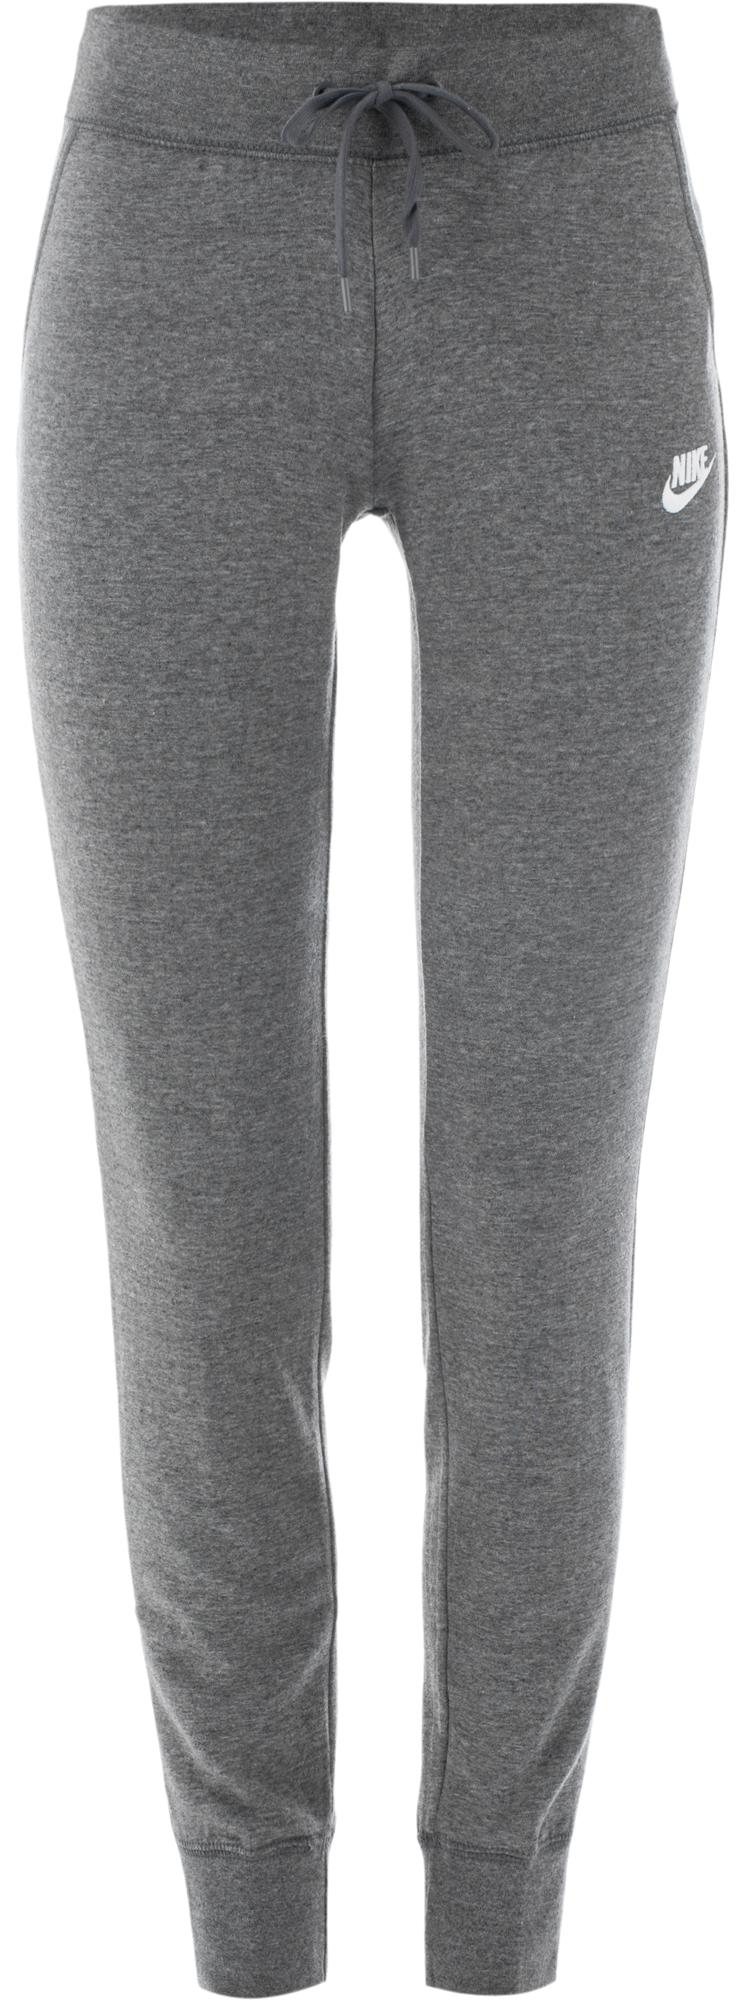 Nike Брюки женские Nike Sportswear, размер 50-52 стоимость